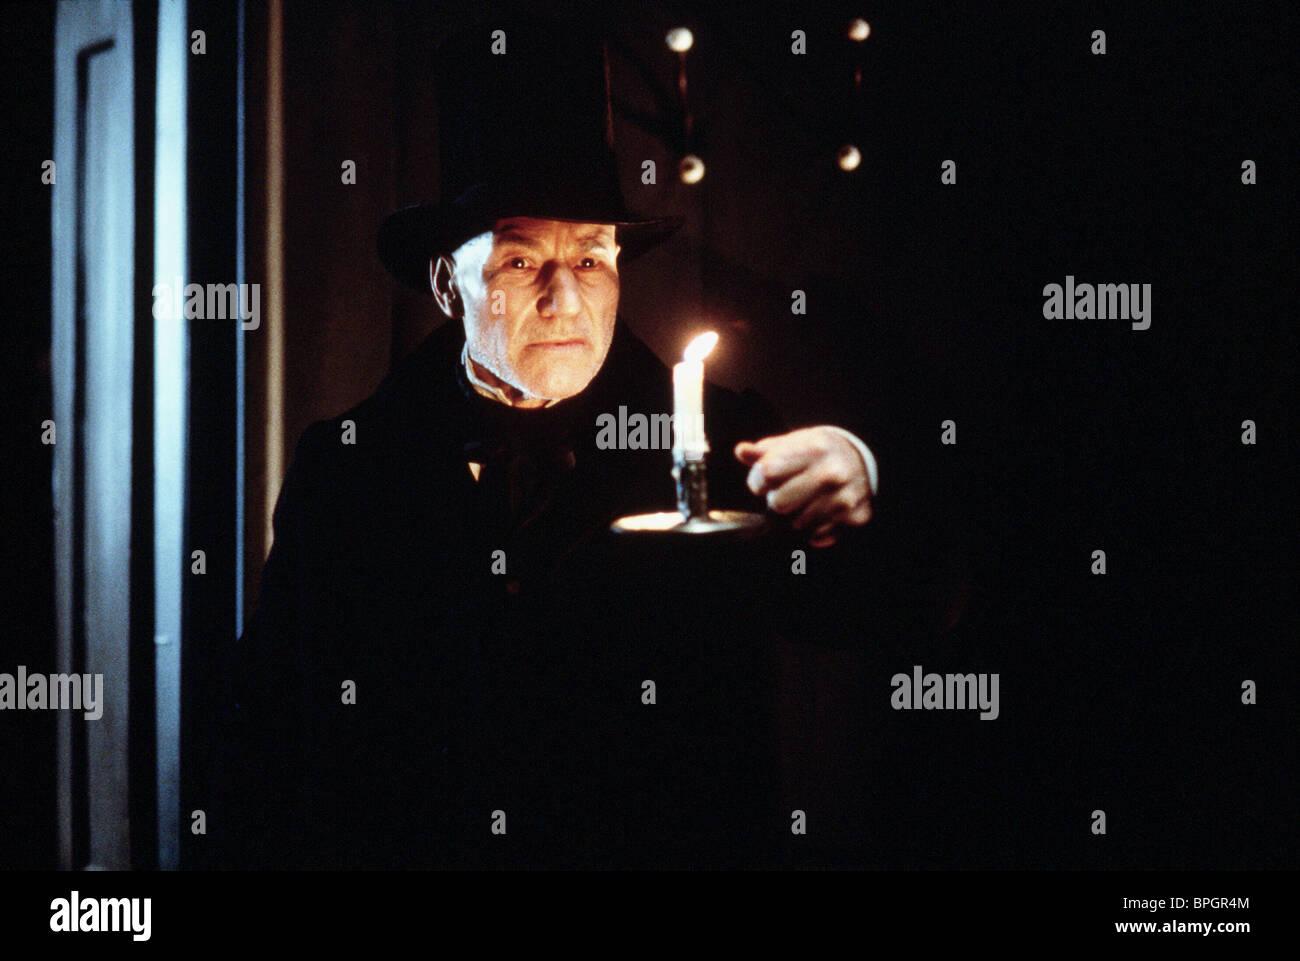 A Christmas Carol 1999.Patrick Stewart A Christmas Carol 1999 Stock Photo